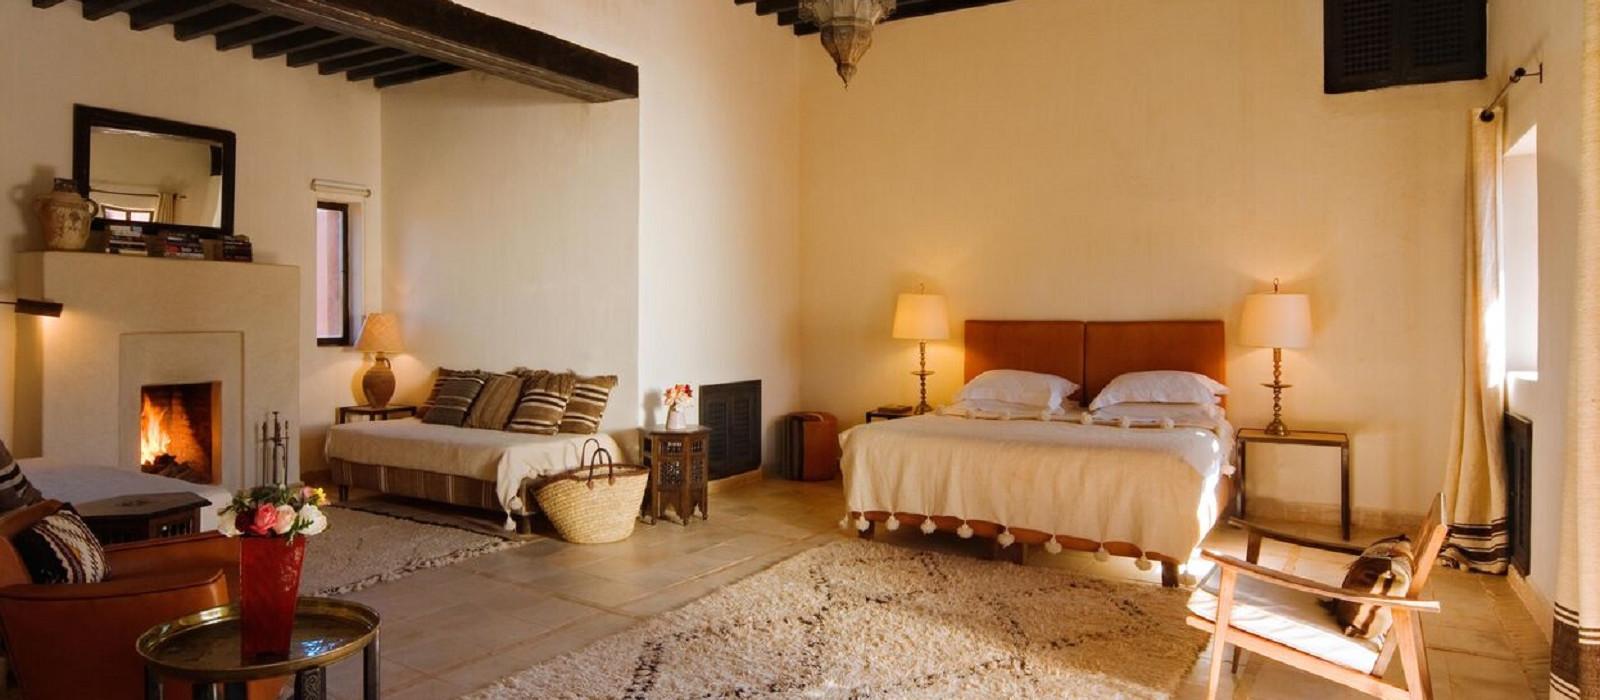 Hotel Kasbah Bab Ourika, Ourika valley Marokko